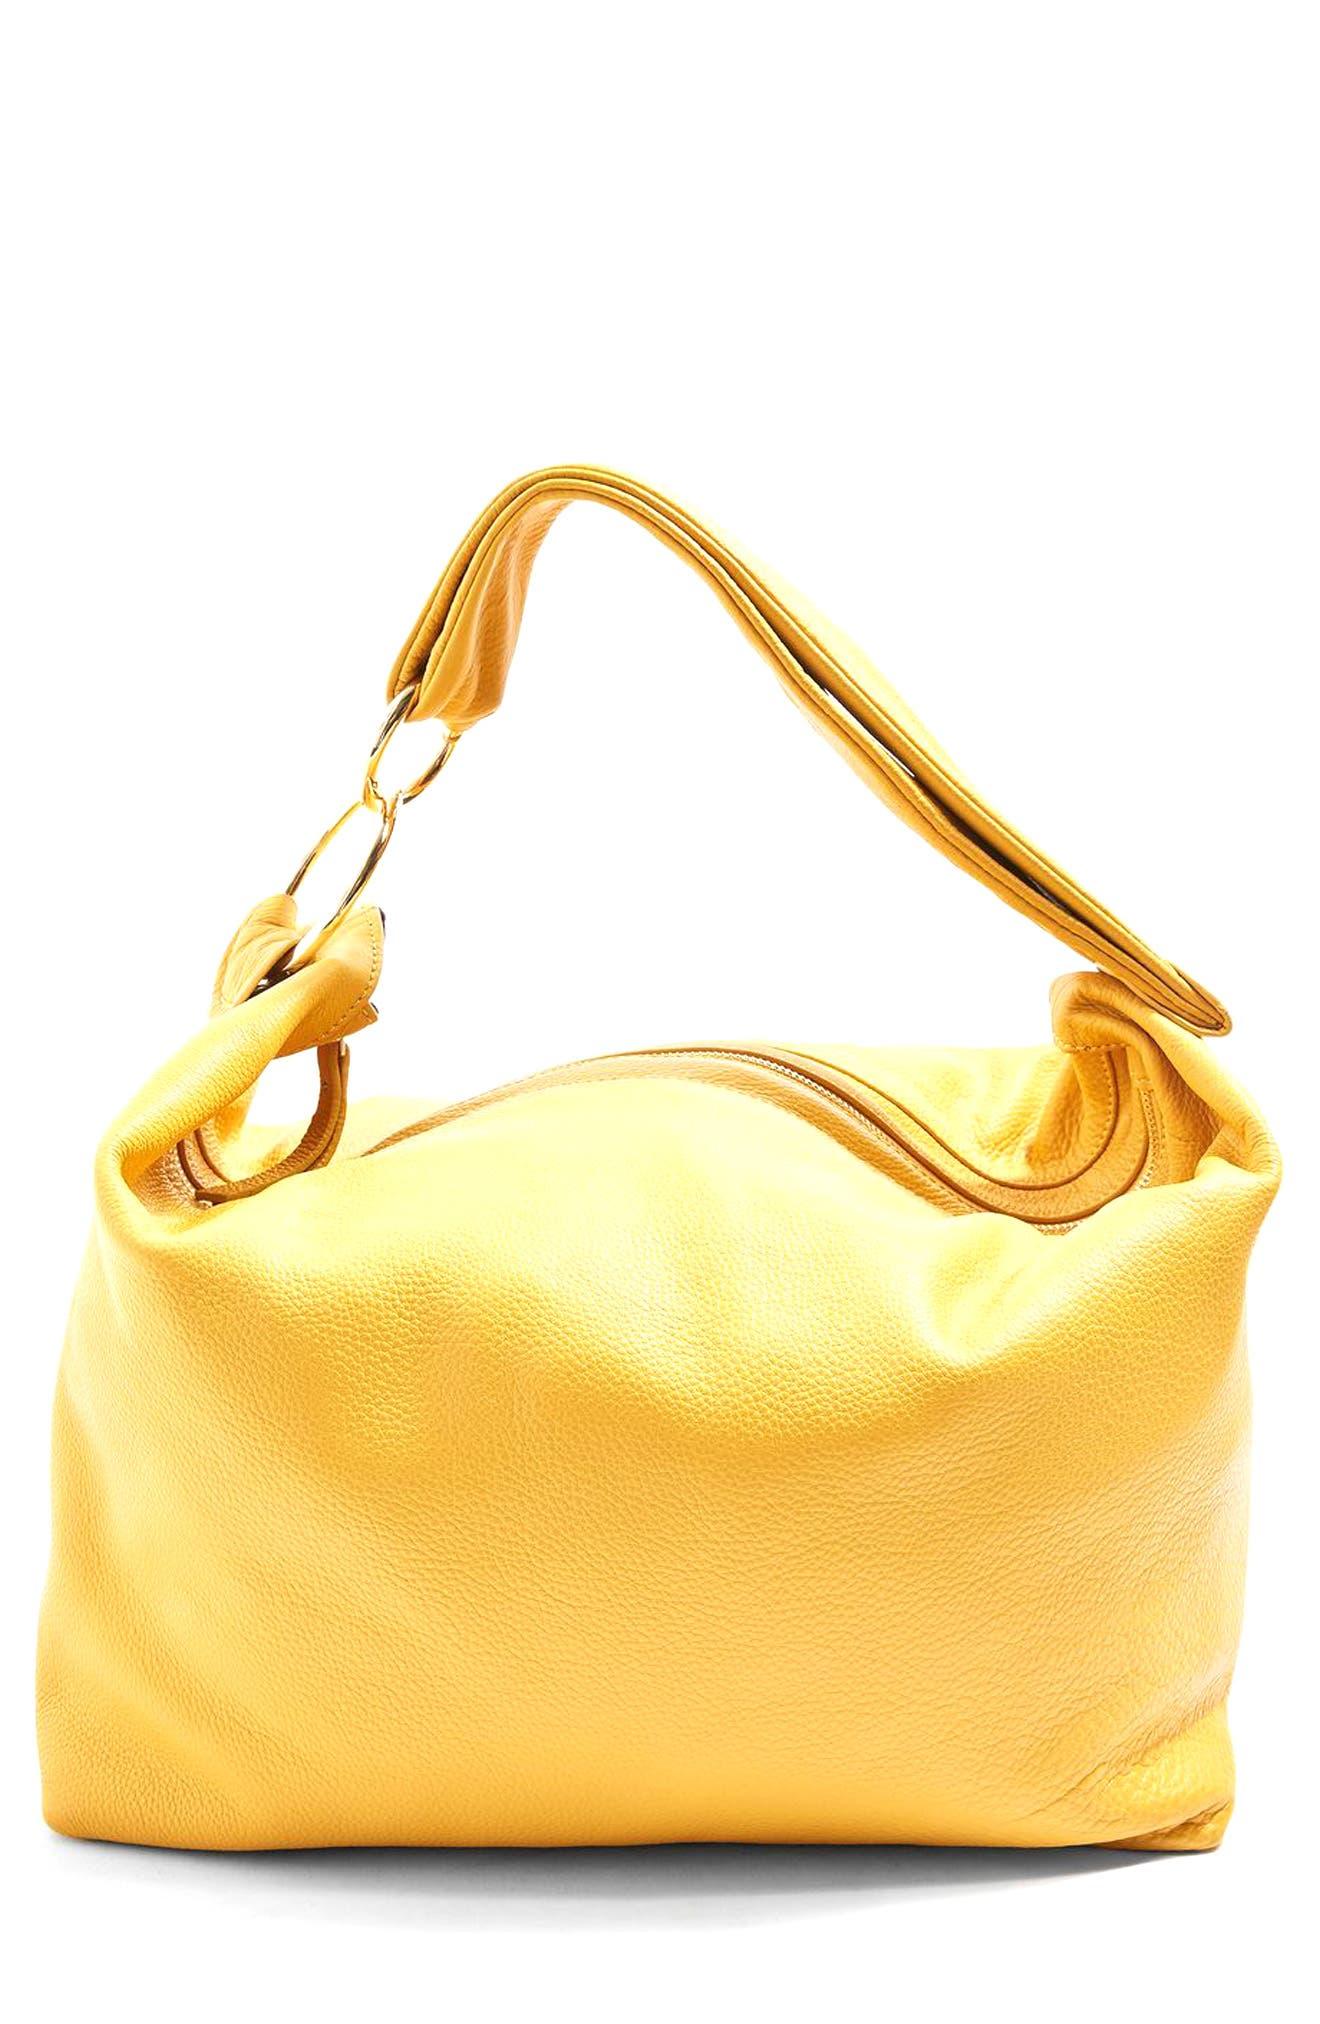 Topshop Premium Leather Hobo Bag